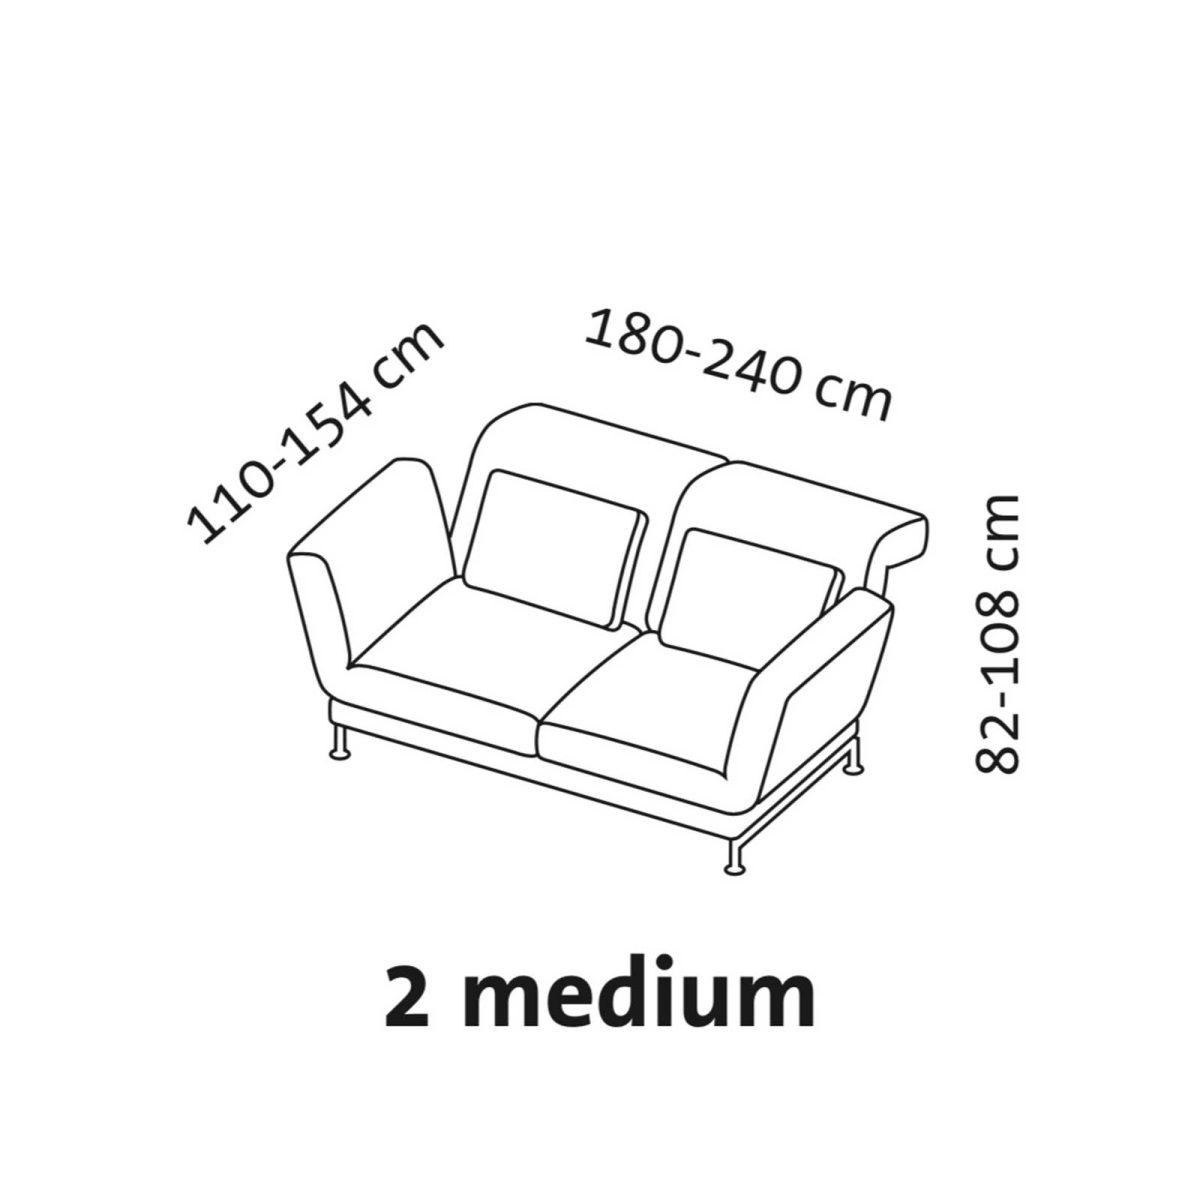 moule 2 medium